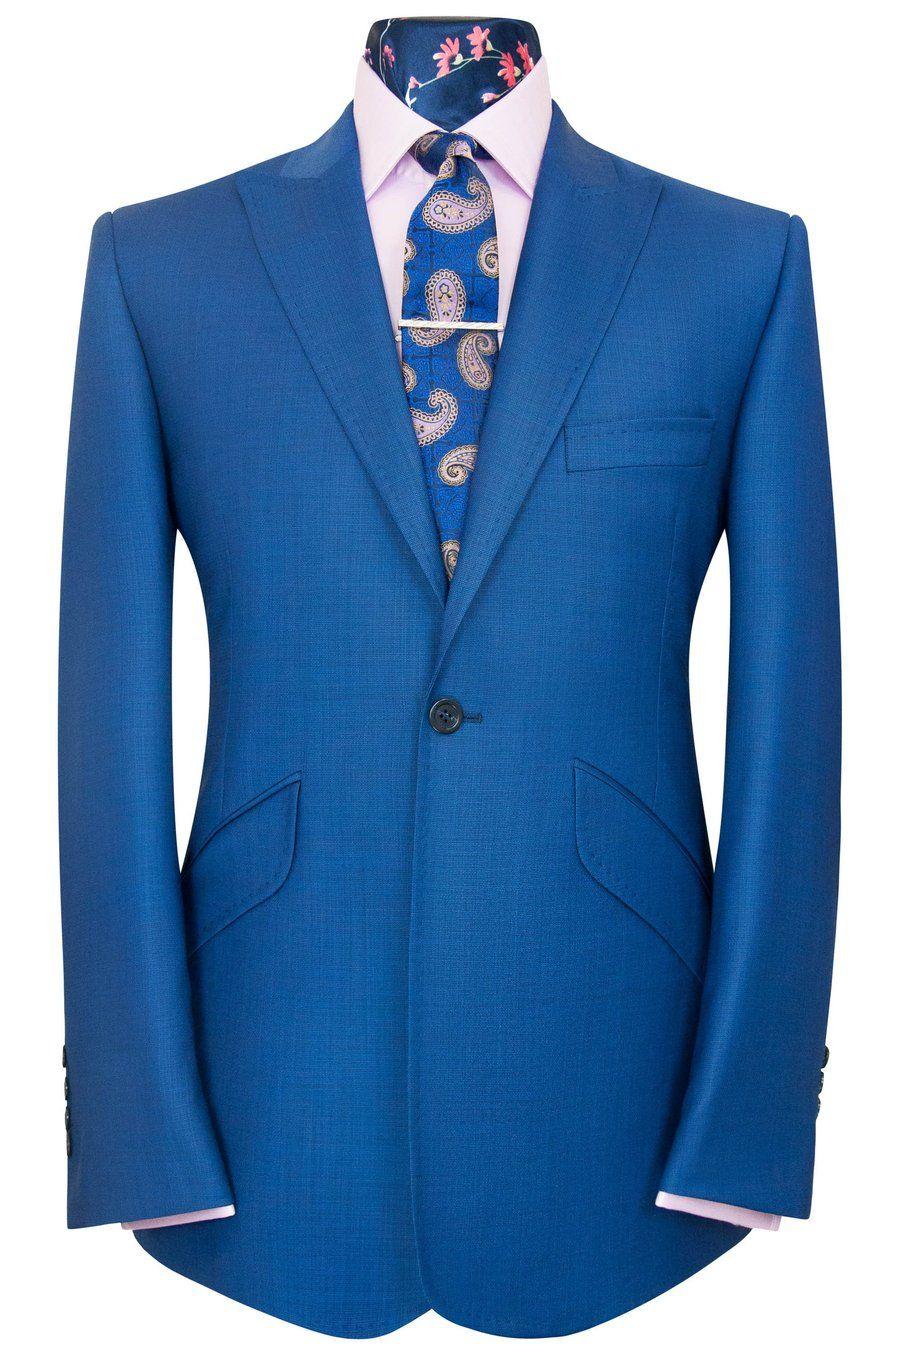 a9ade3bc84e3 The Ashmore Zaffre Blue Birdseye Suit in 2019 | Vêtements homme ...